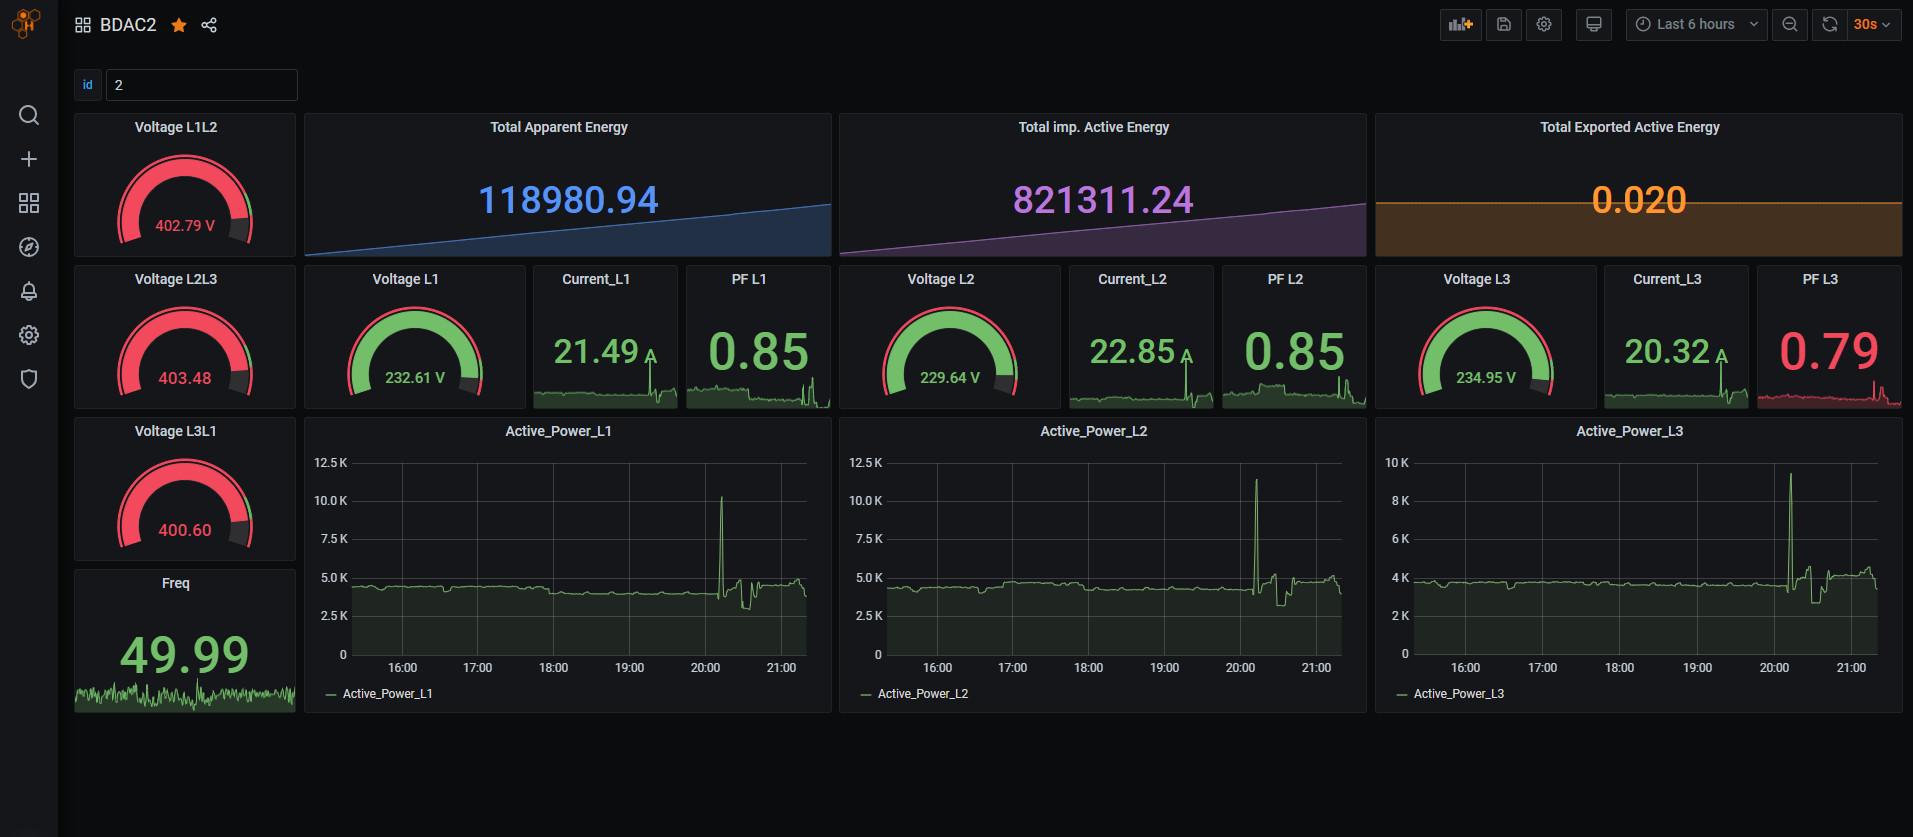 IoT Visualization and Monitoring